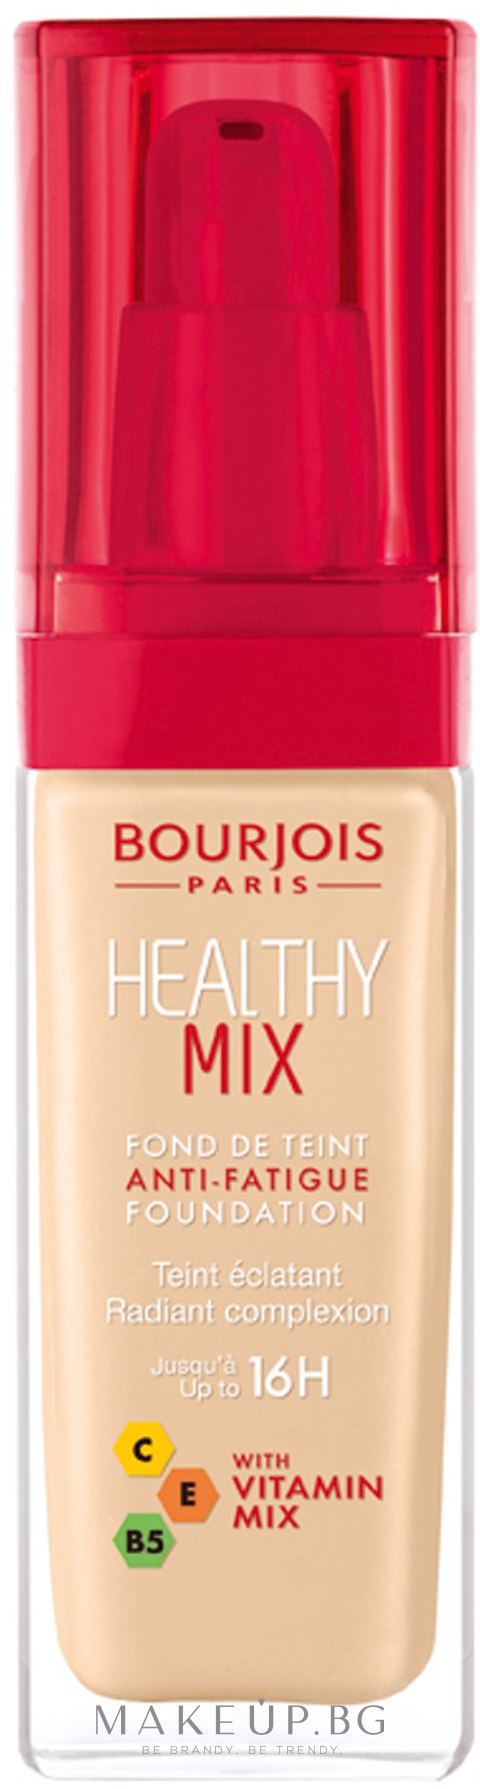 Озаряващ течен фон дьо тен - Bourjois Radiance Reveal Healthy Mix Foundation — снимка 50 - Rose Ivory